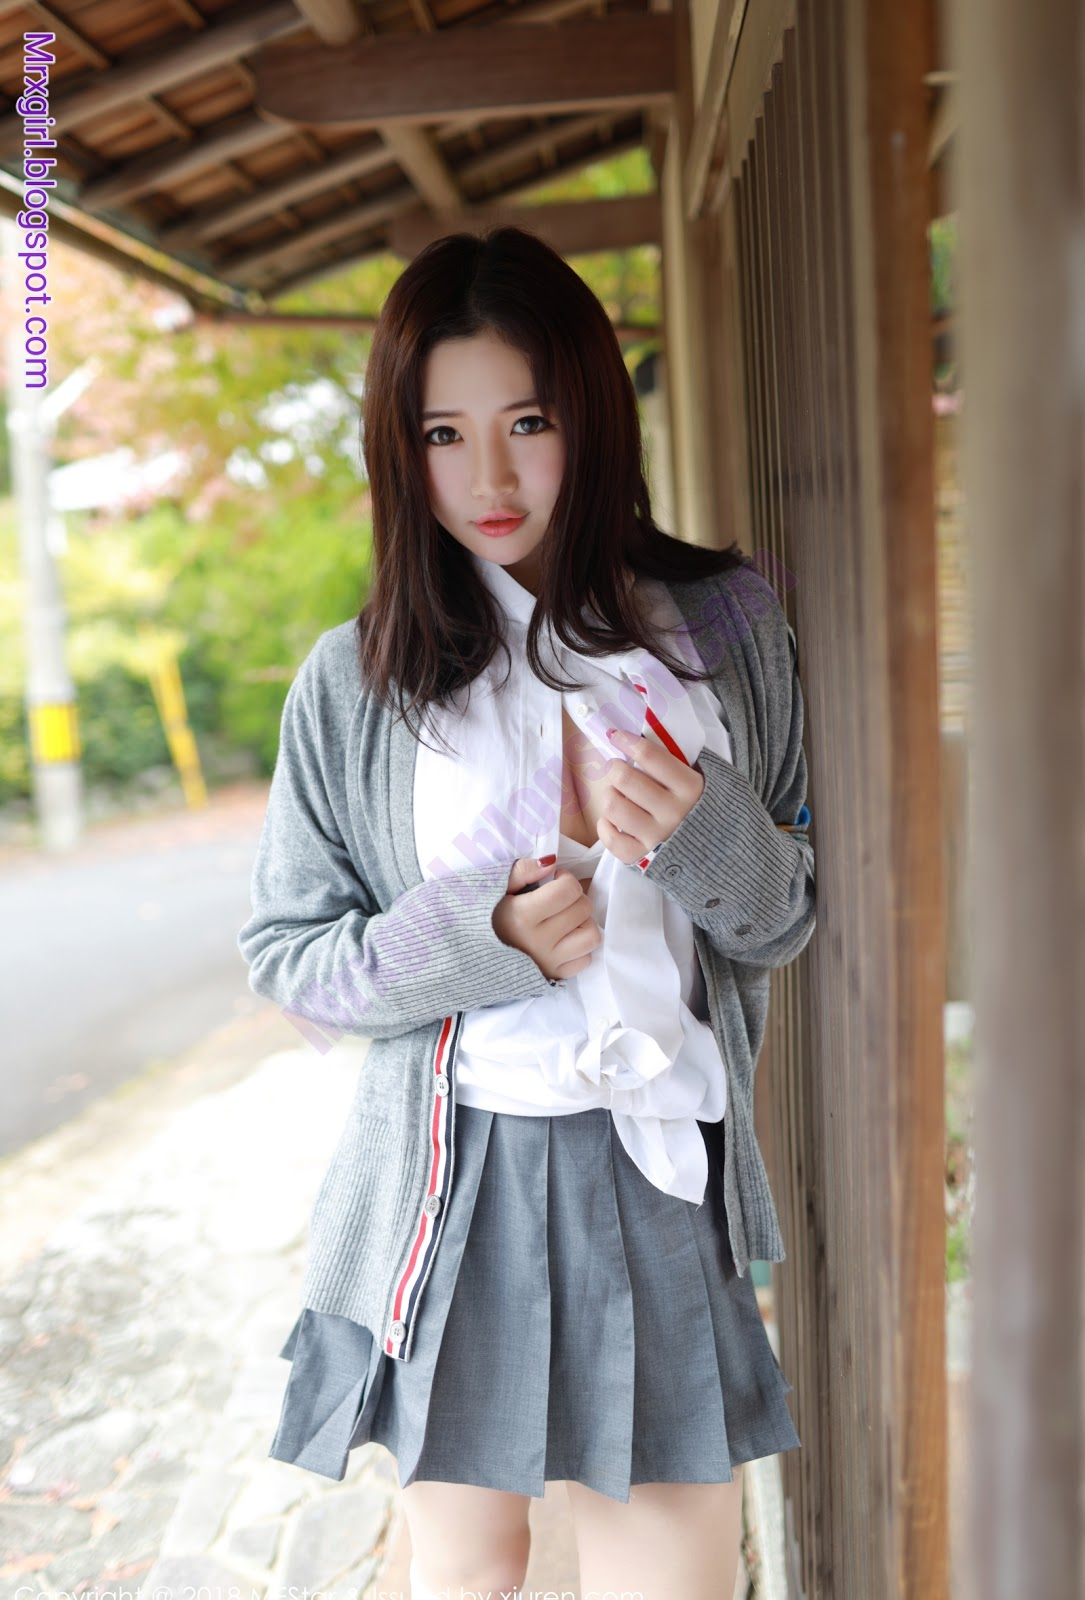 MFStar Vol. 338 Xu Cake - Best Hot Girls